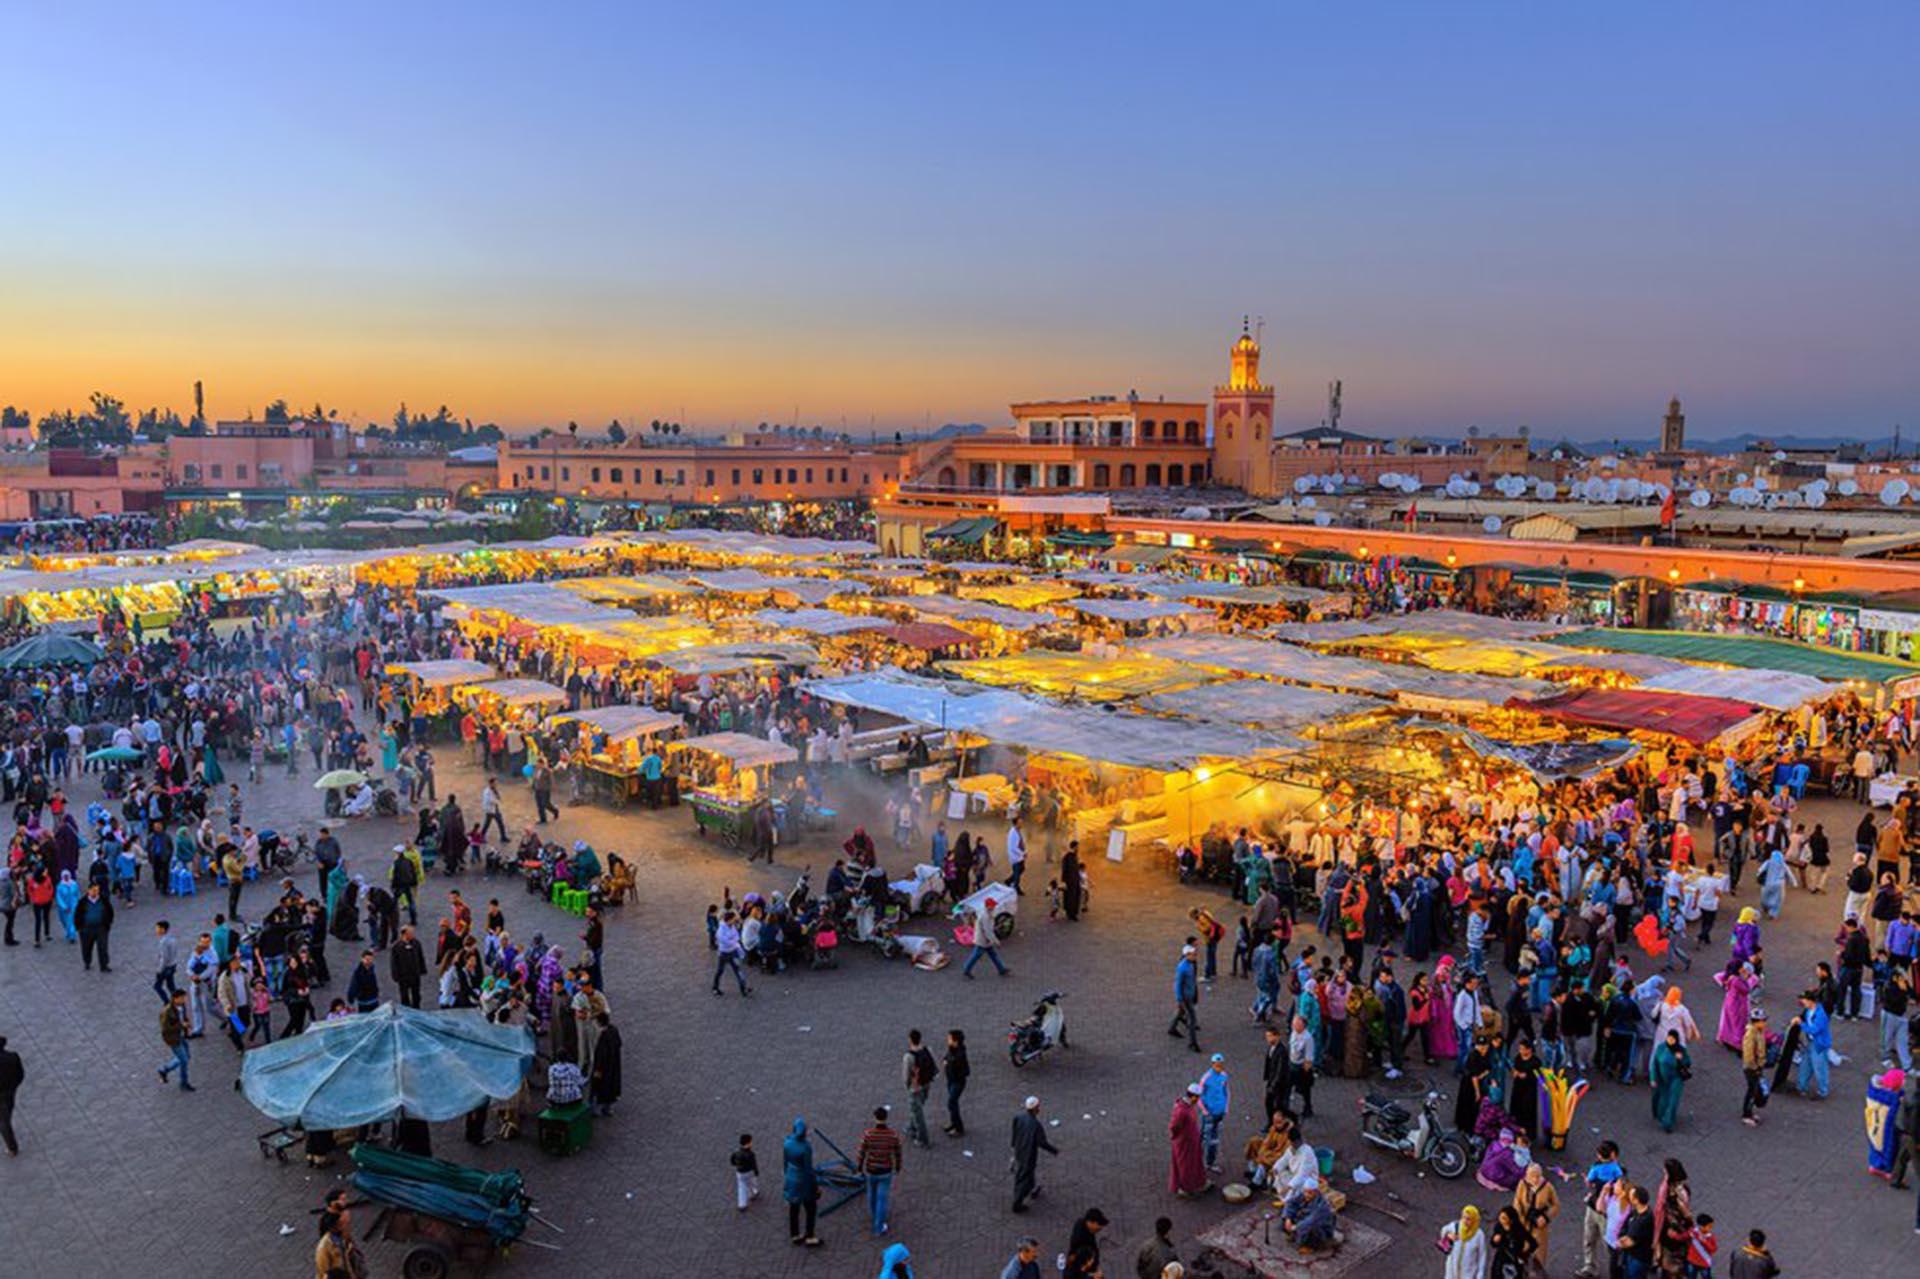 Plaza Yamaa el Fna (Marrakech, Marruecos)